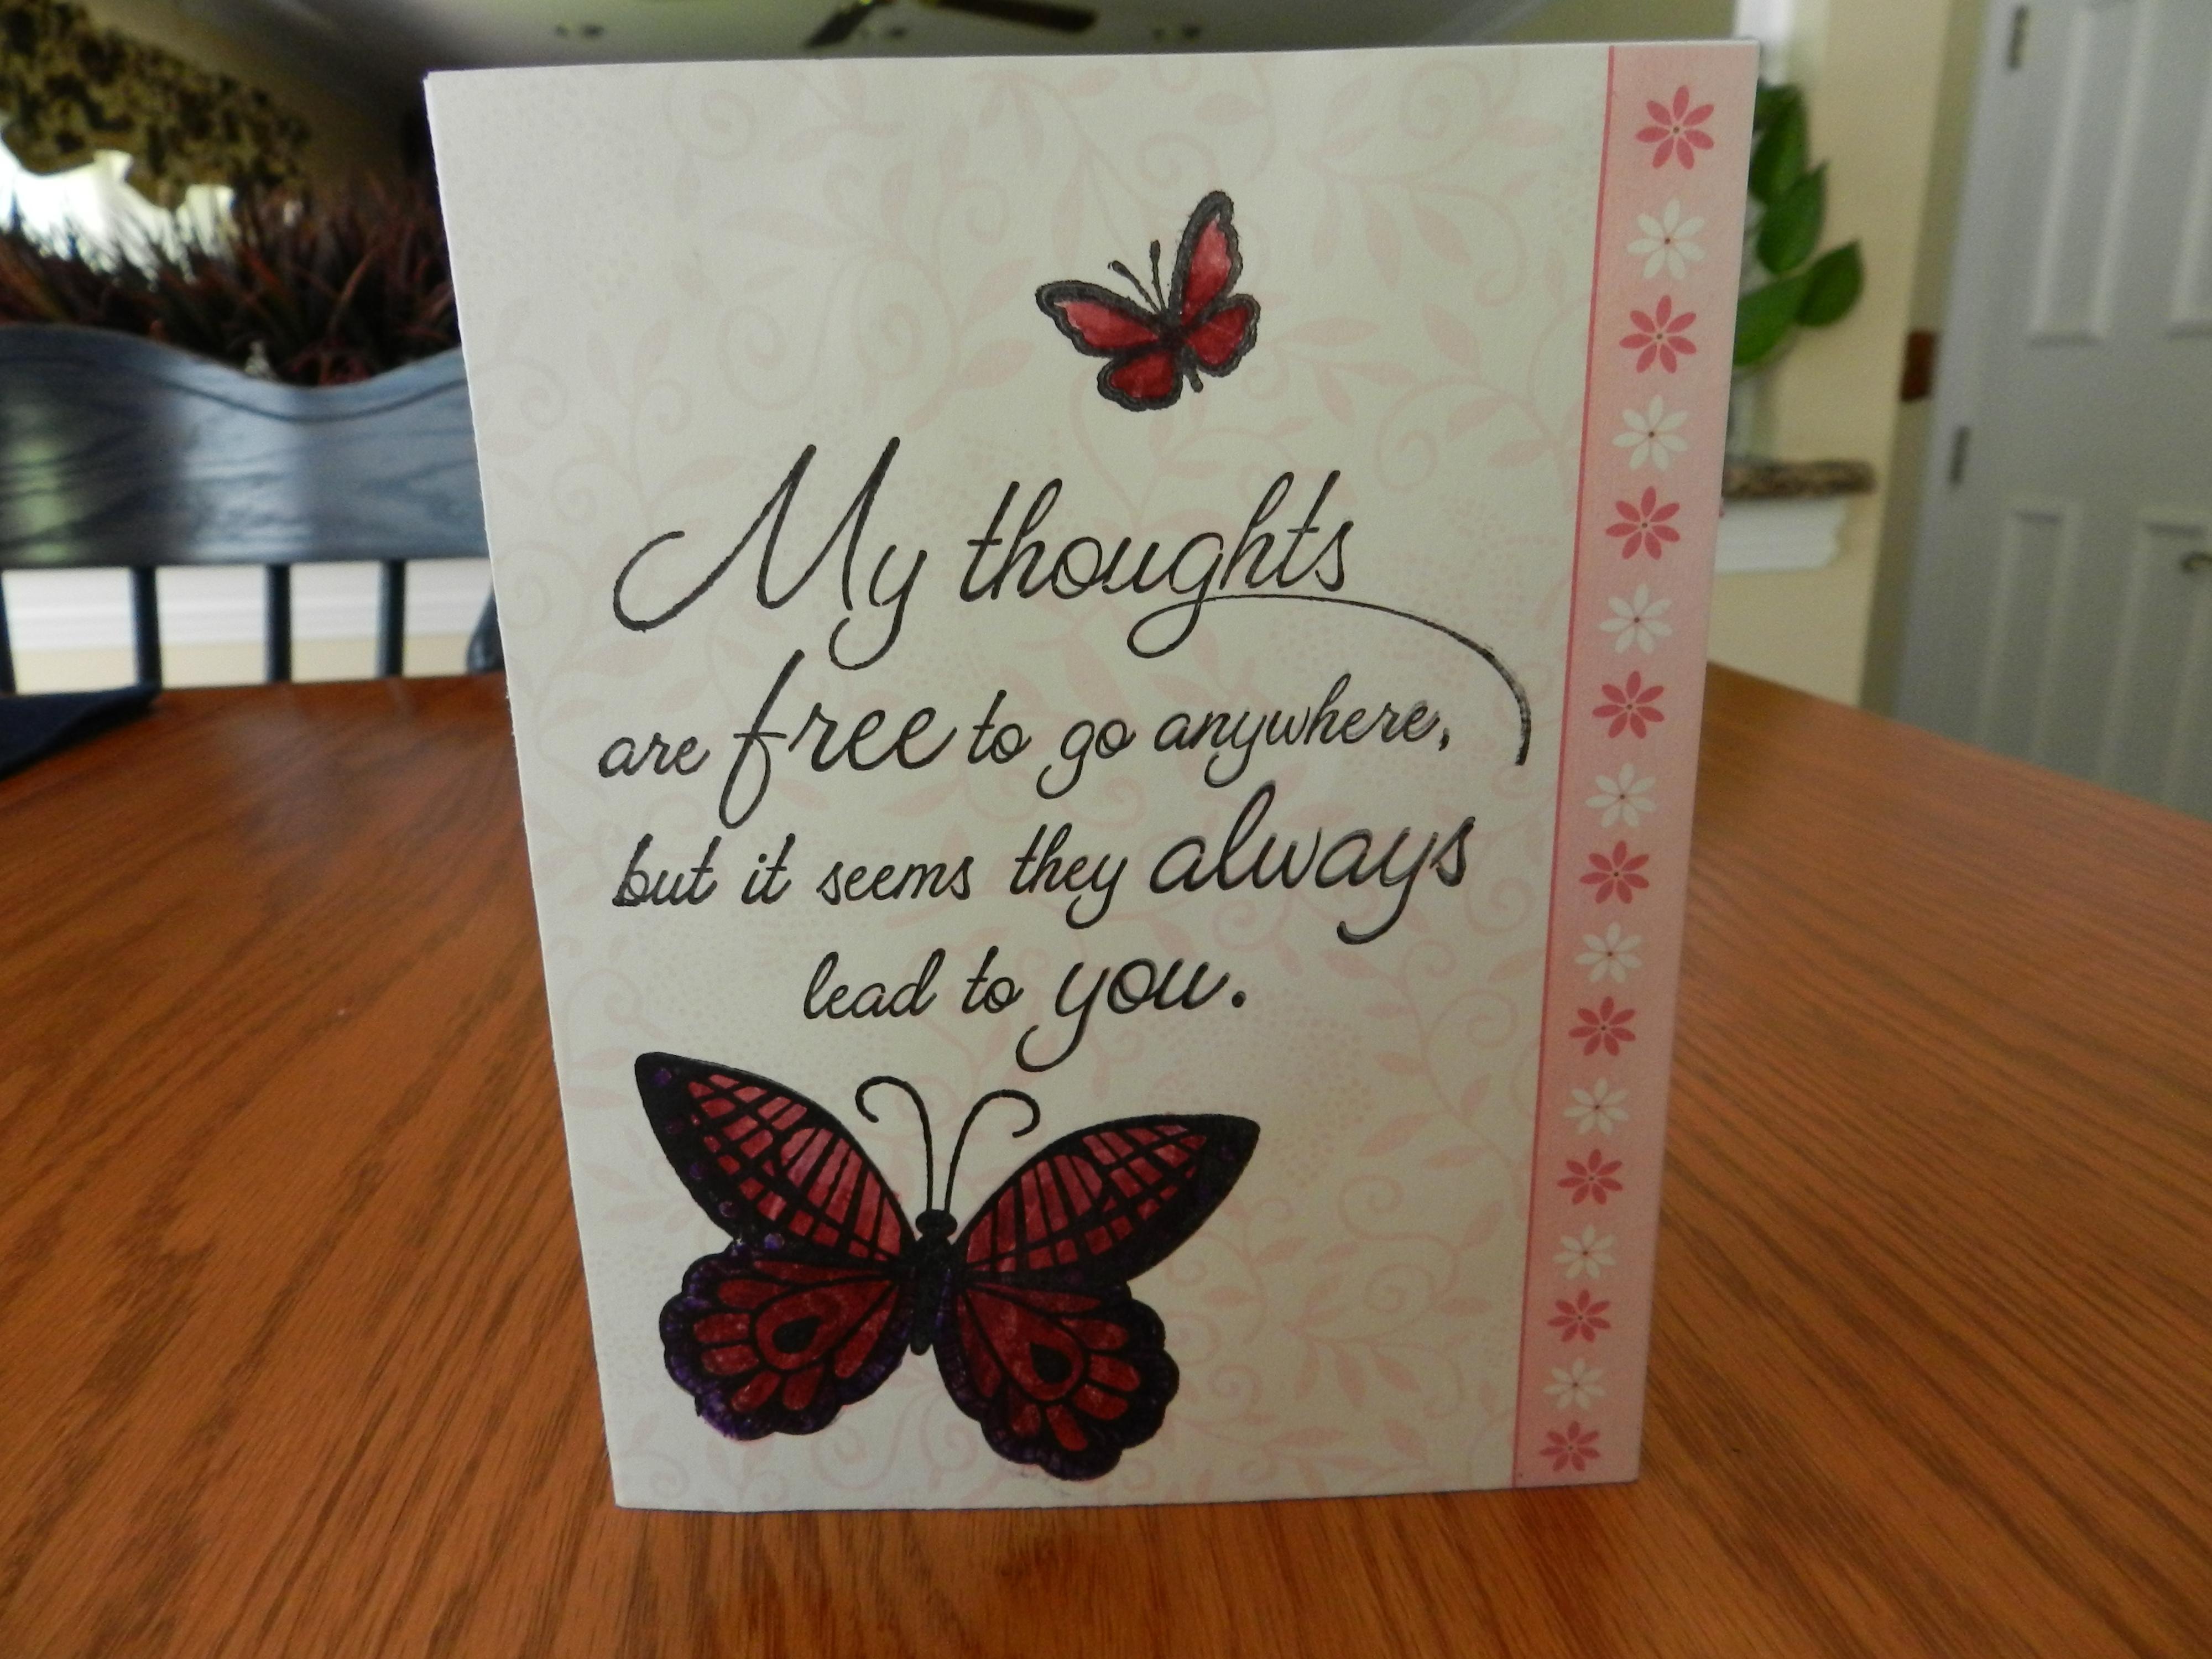 Happy th anniversary free milestones ecards greeting cards